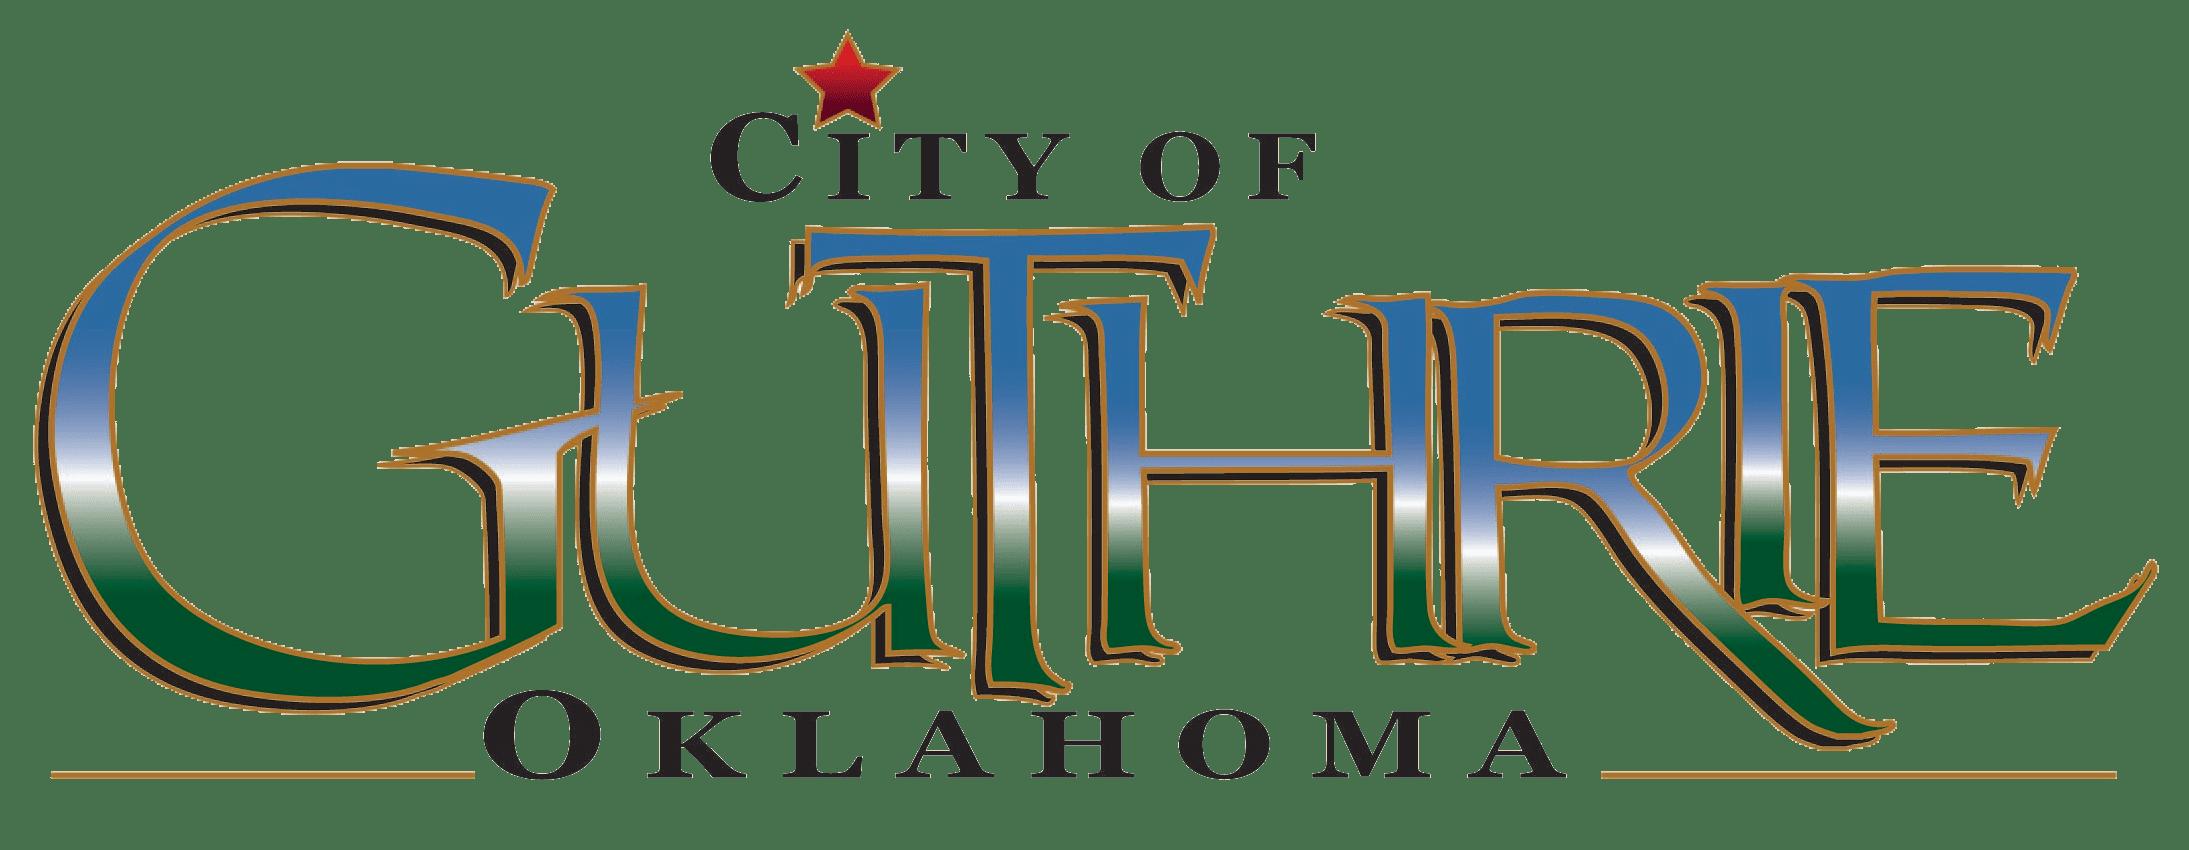 City of Guthrie Logo